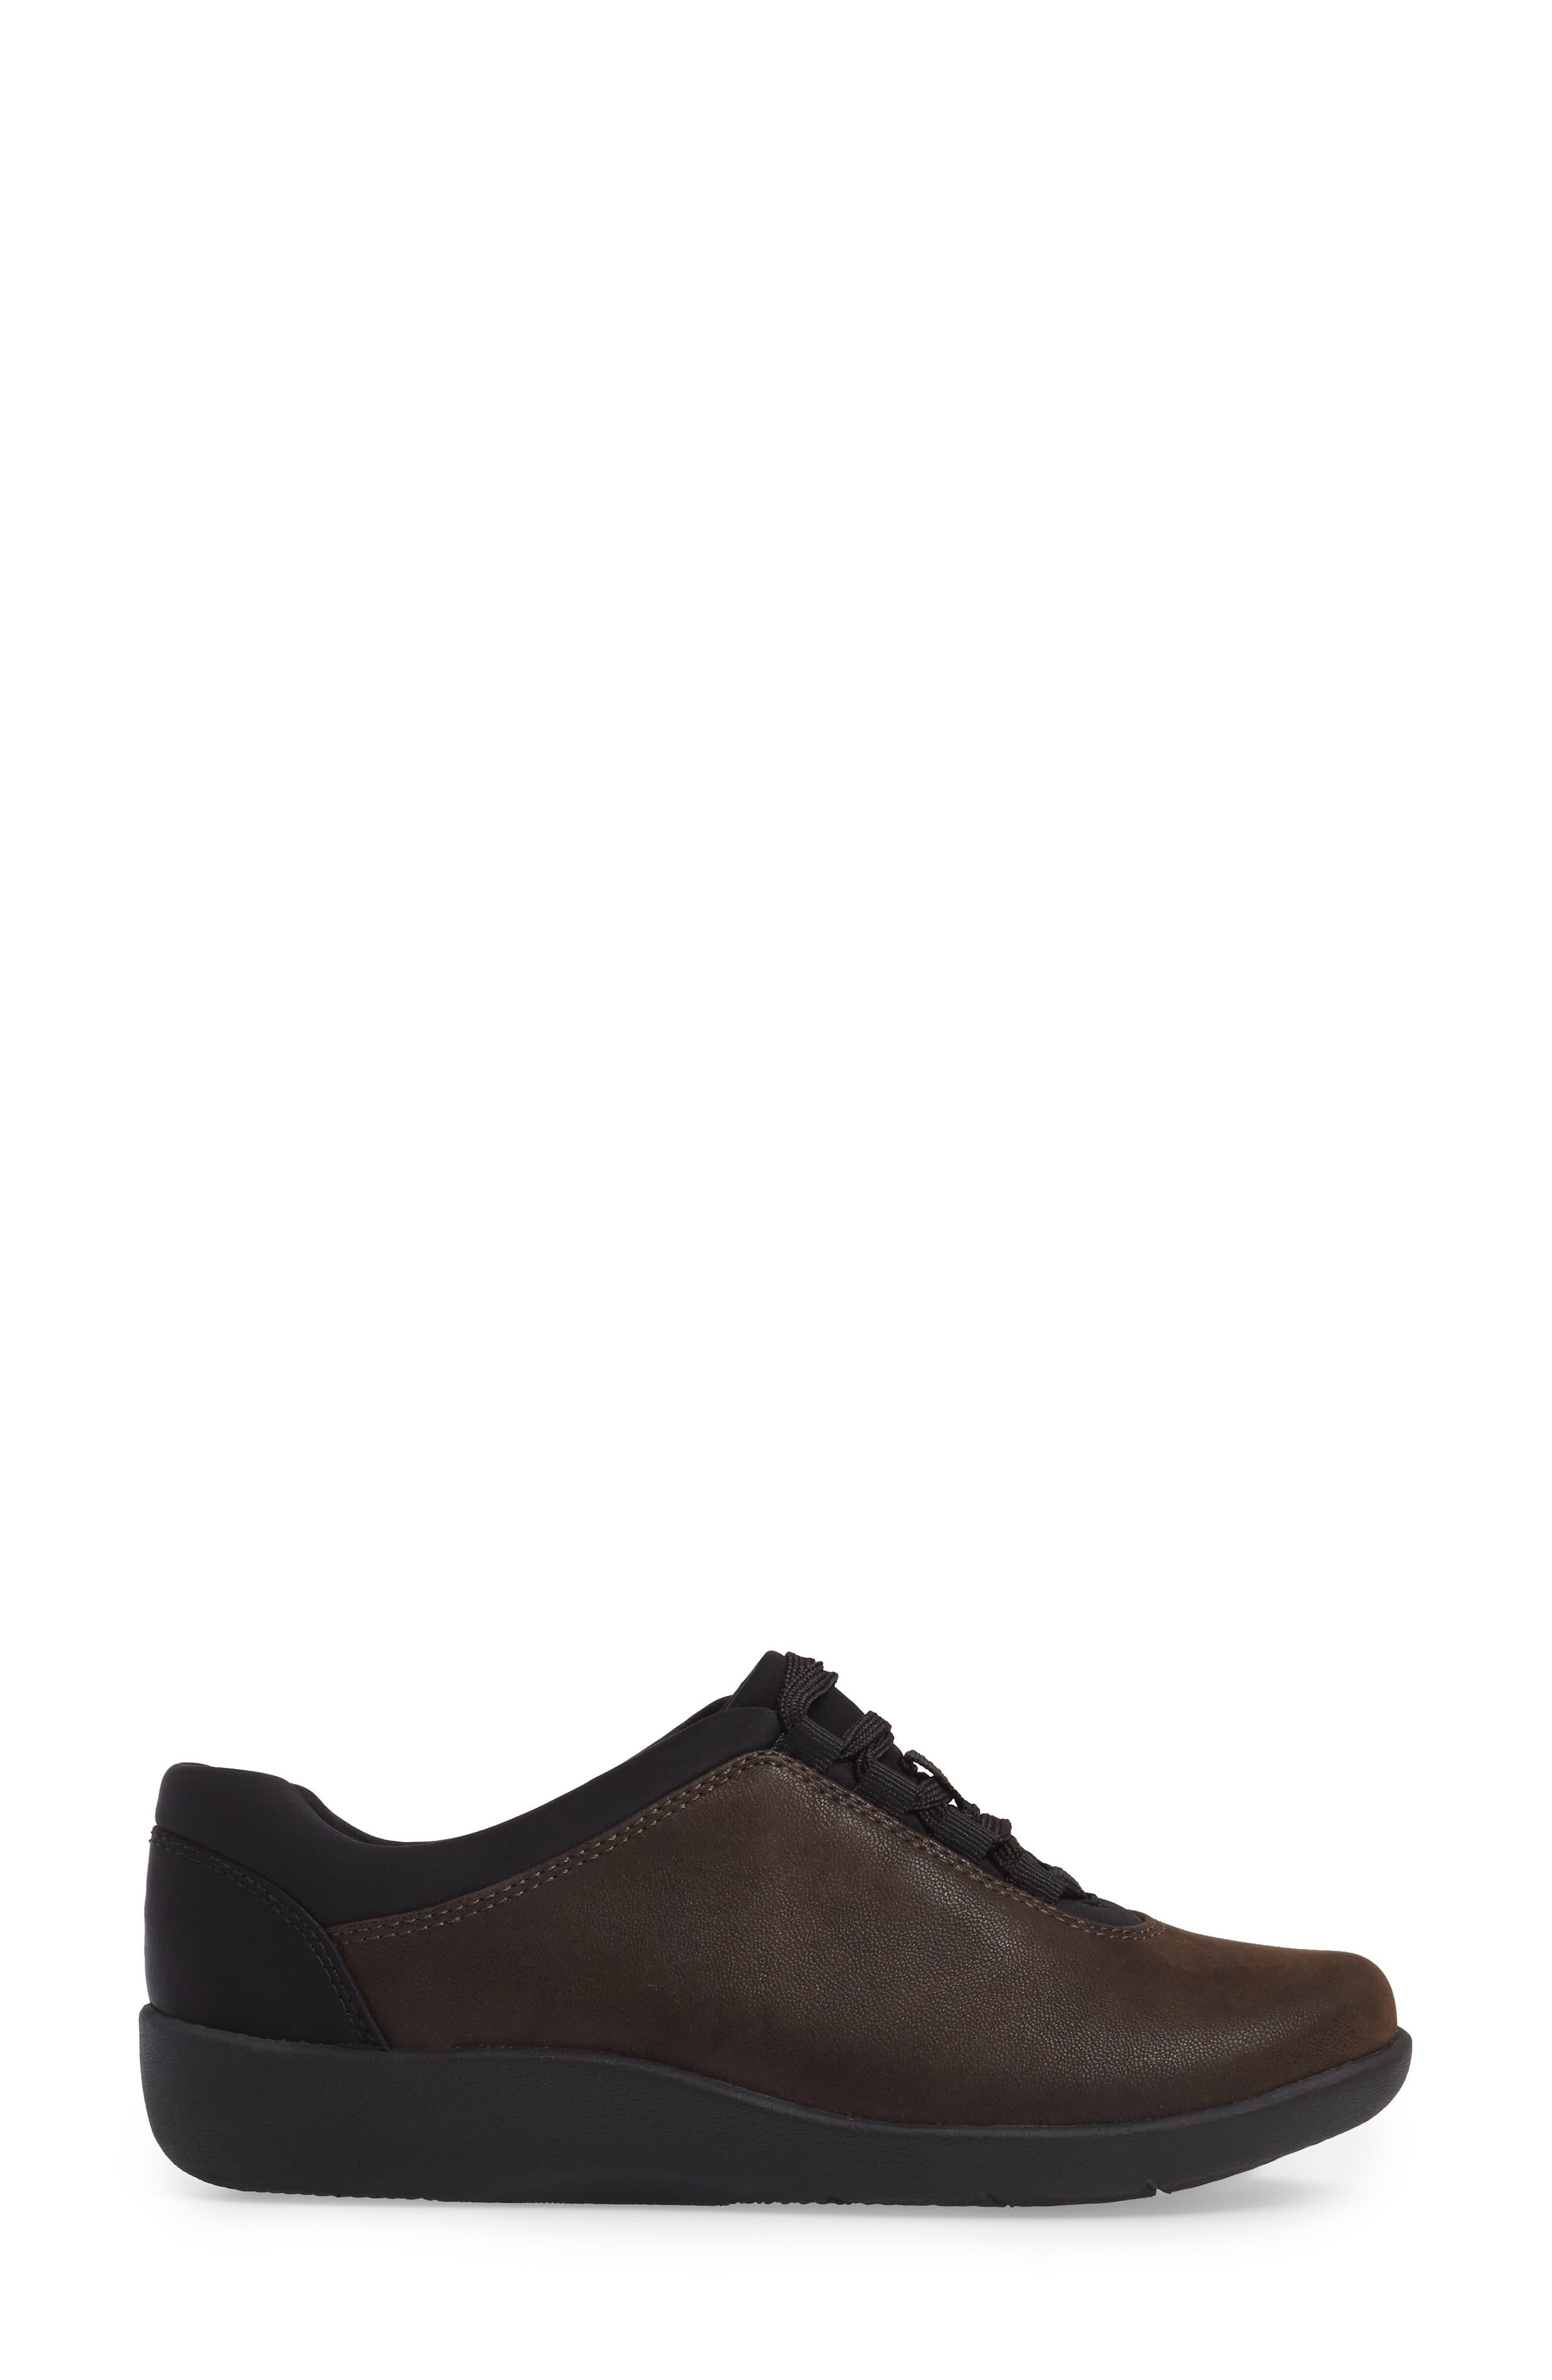 Sillian Pine Sneaker,                             Alternate thumbnail 3, color,                             Brown Canvas